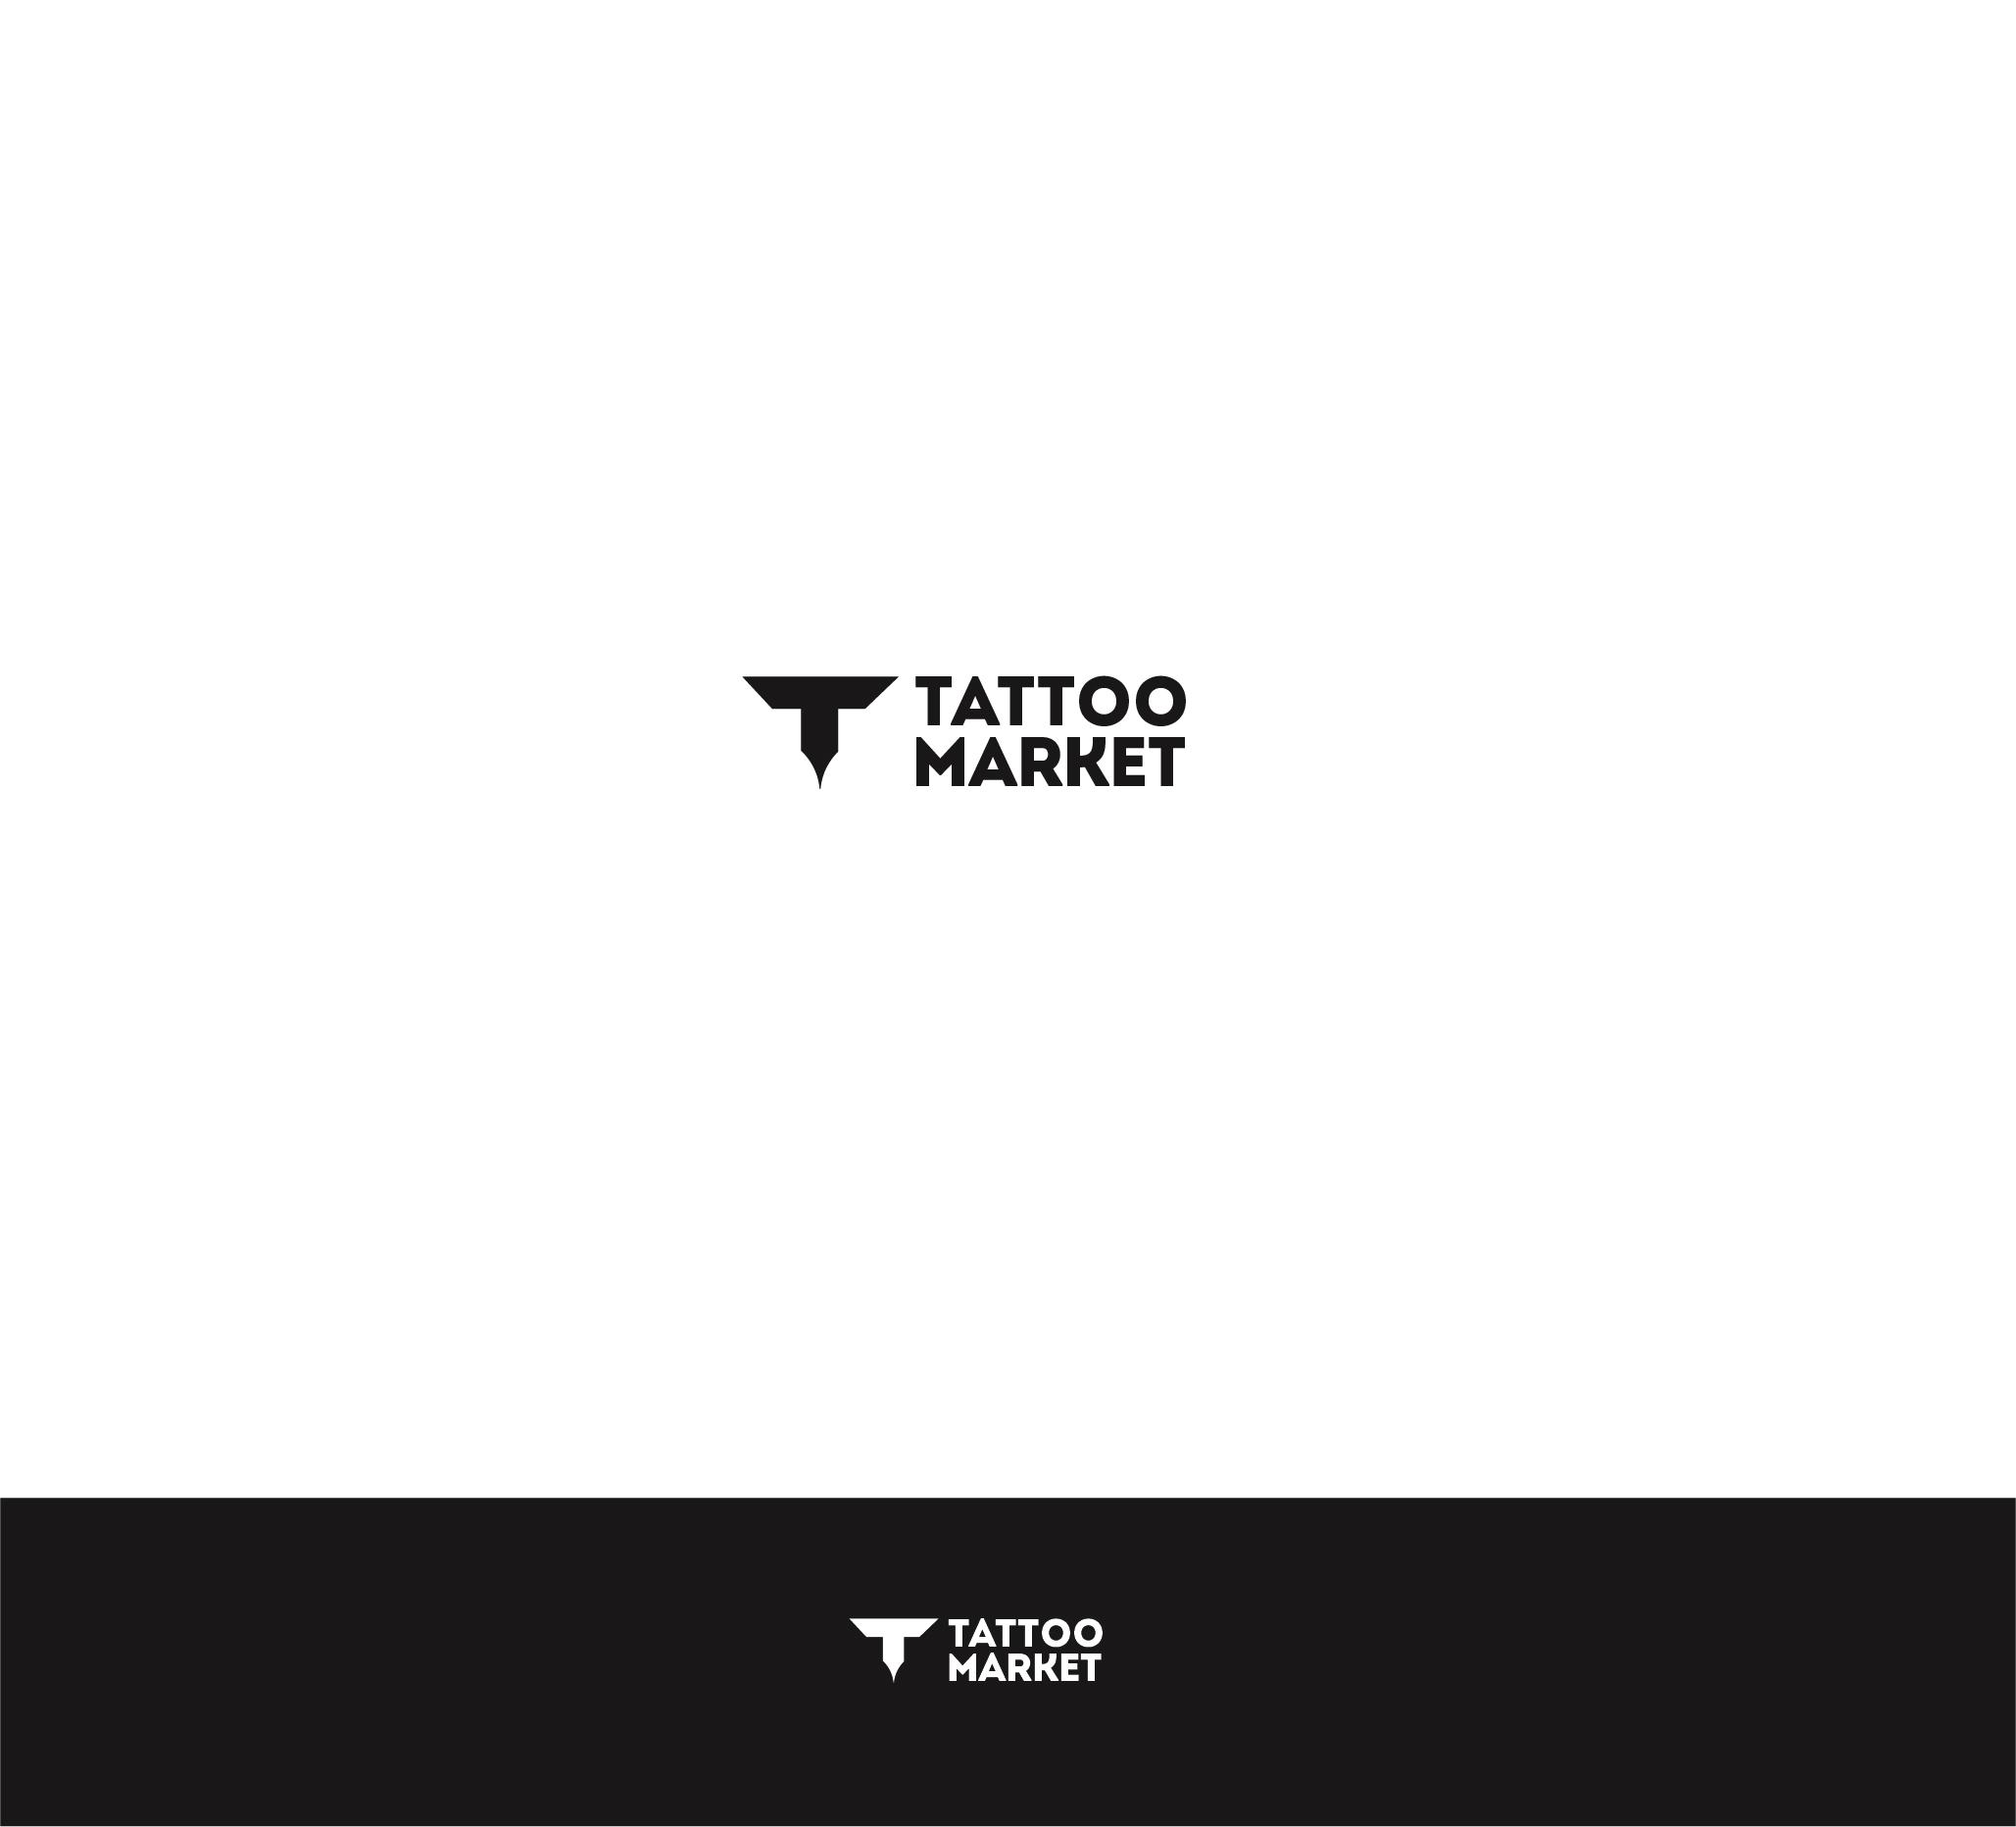 Редизайн логотипа магазина тату оборудования TattooMarket.ru фото f_3195c3c8072bef54.jpg